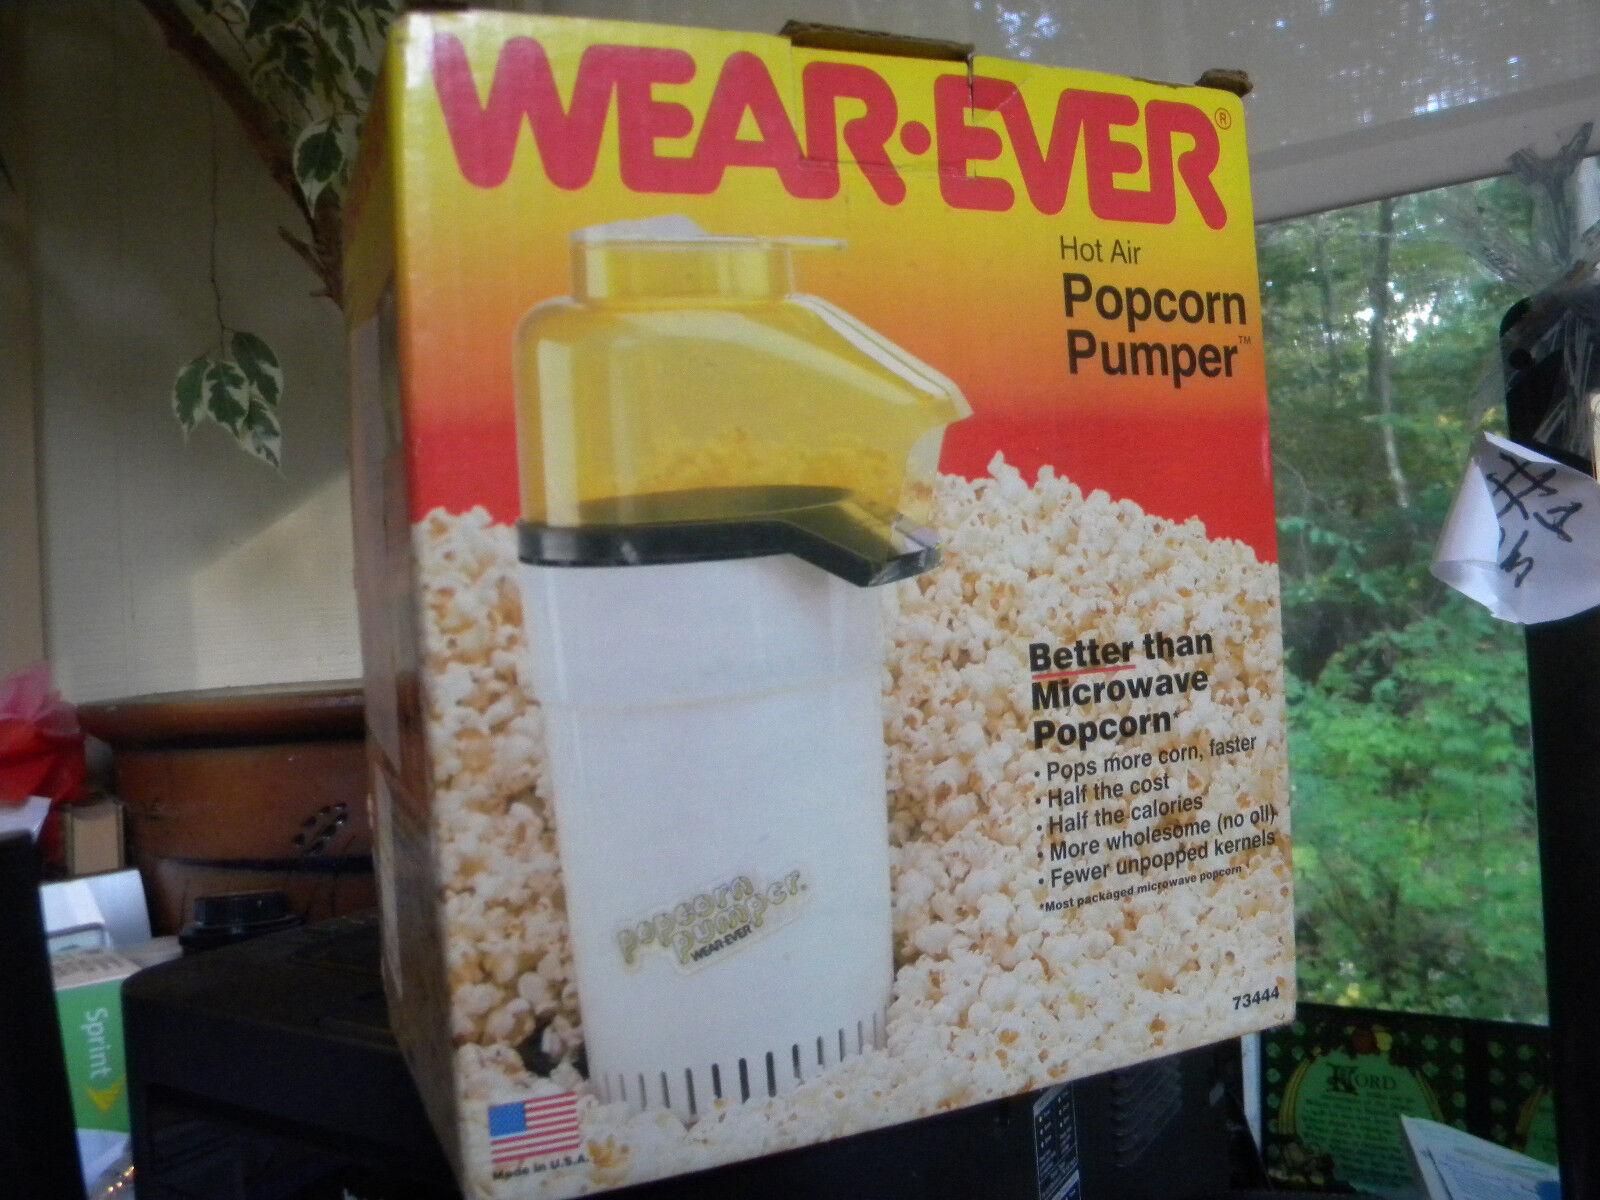 VINTAGE  WEAR EVER  HOT AIR  POPCORN PUMPER